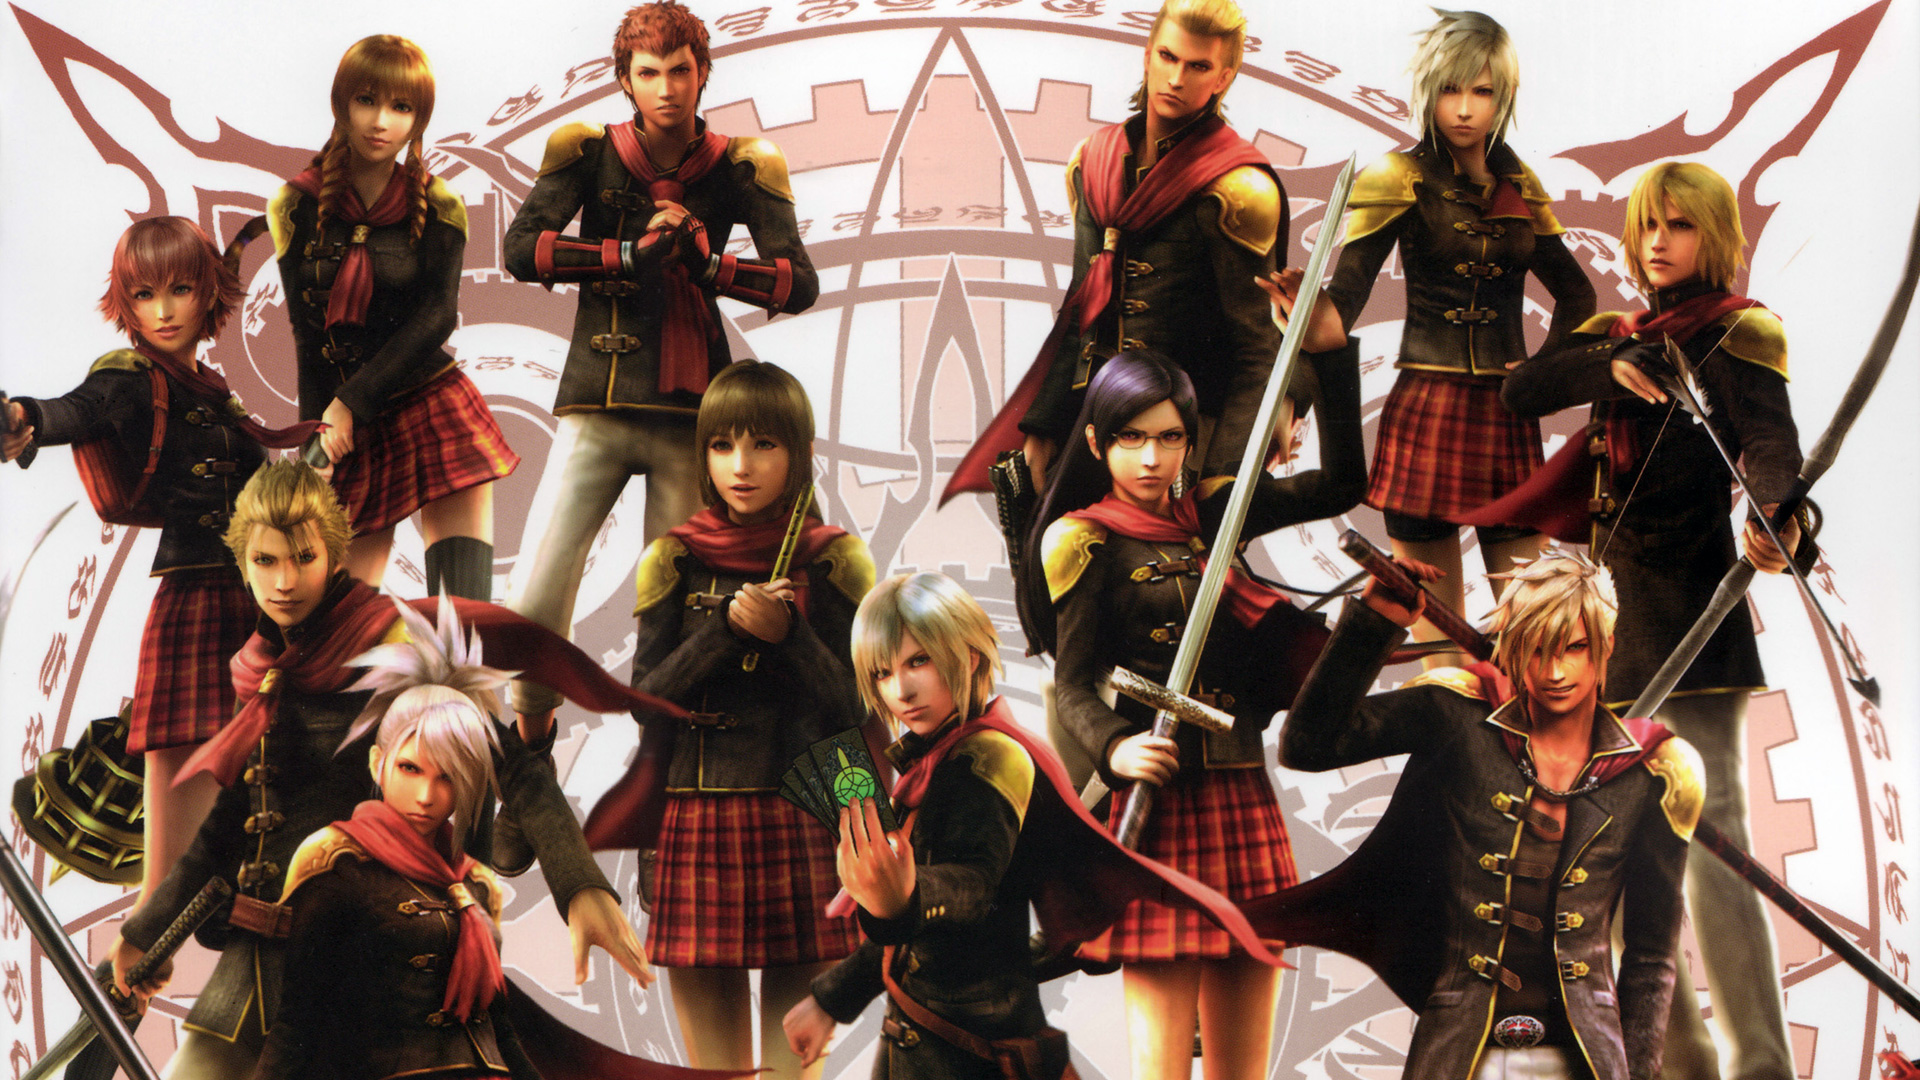 Final Fantasy Type 0 Hd Games 4k Wallpapers Images: Final Fantasy Type-0 Wallpaper 7